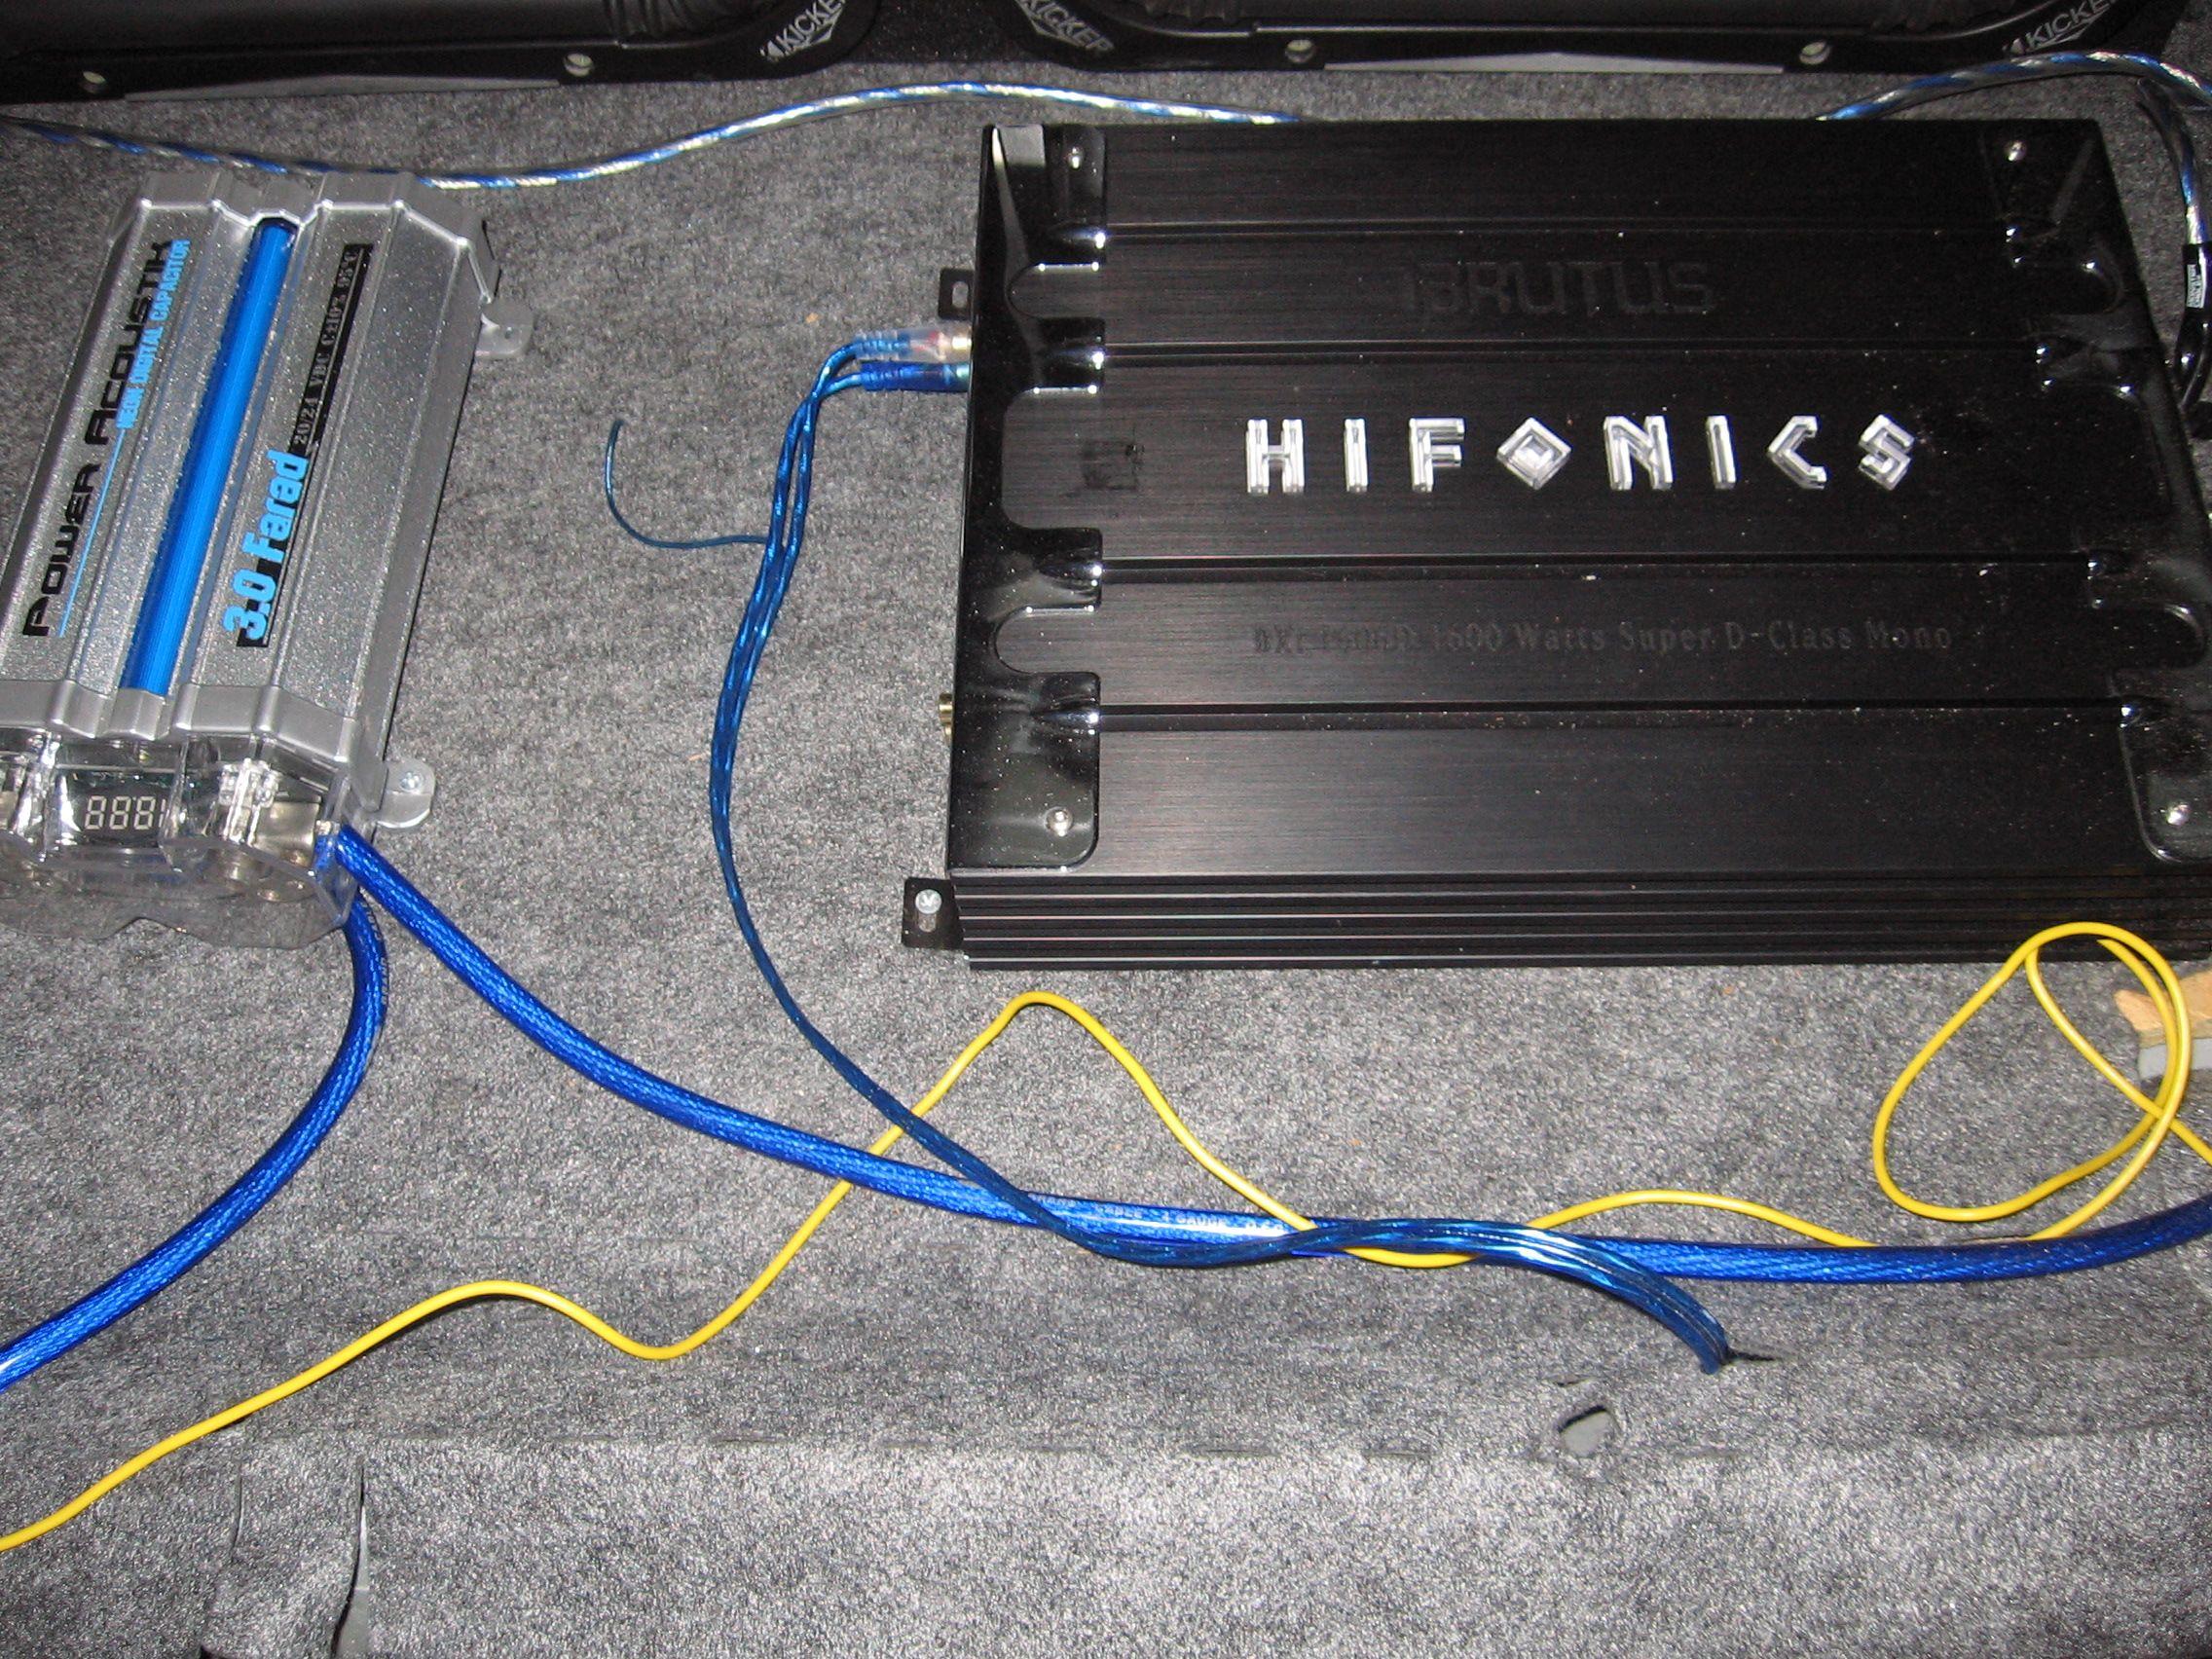 hifonics hfi12d4 wiring diagram how to draw moment diagrams farad capacitor